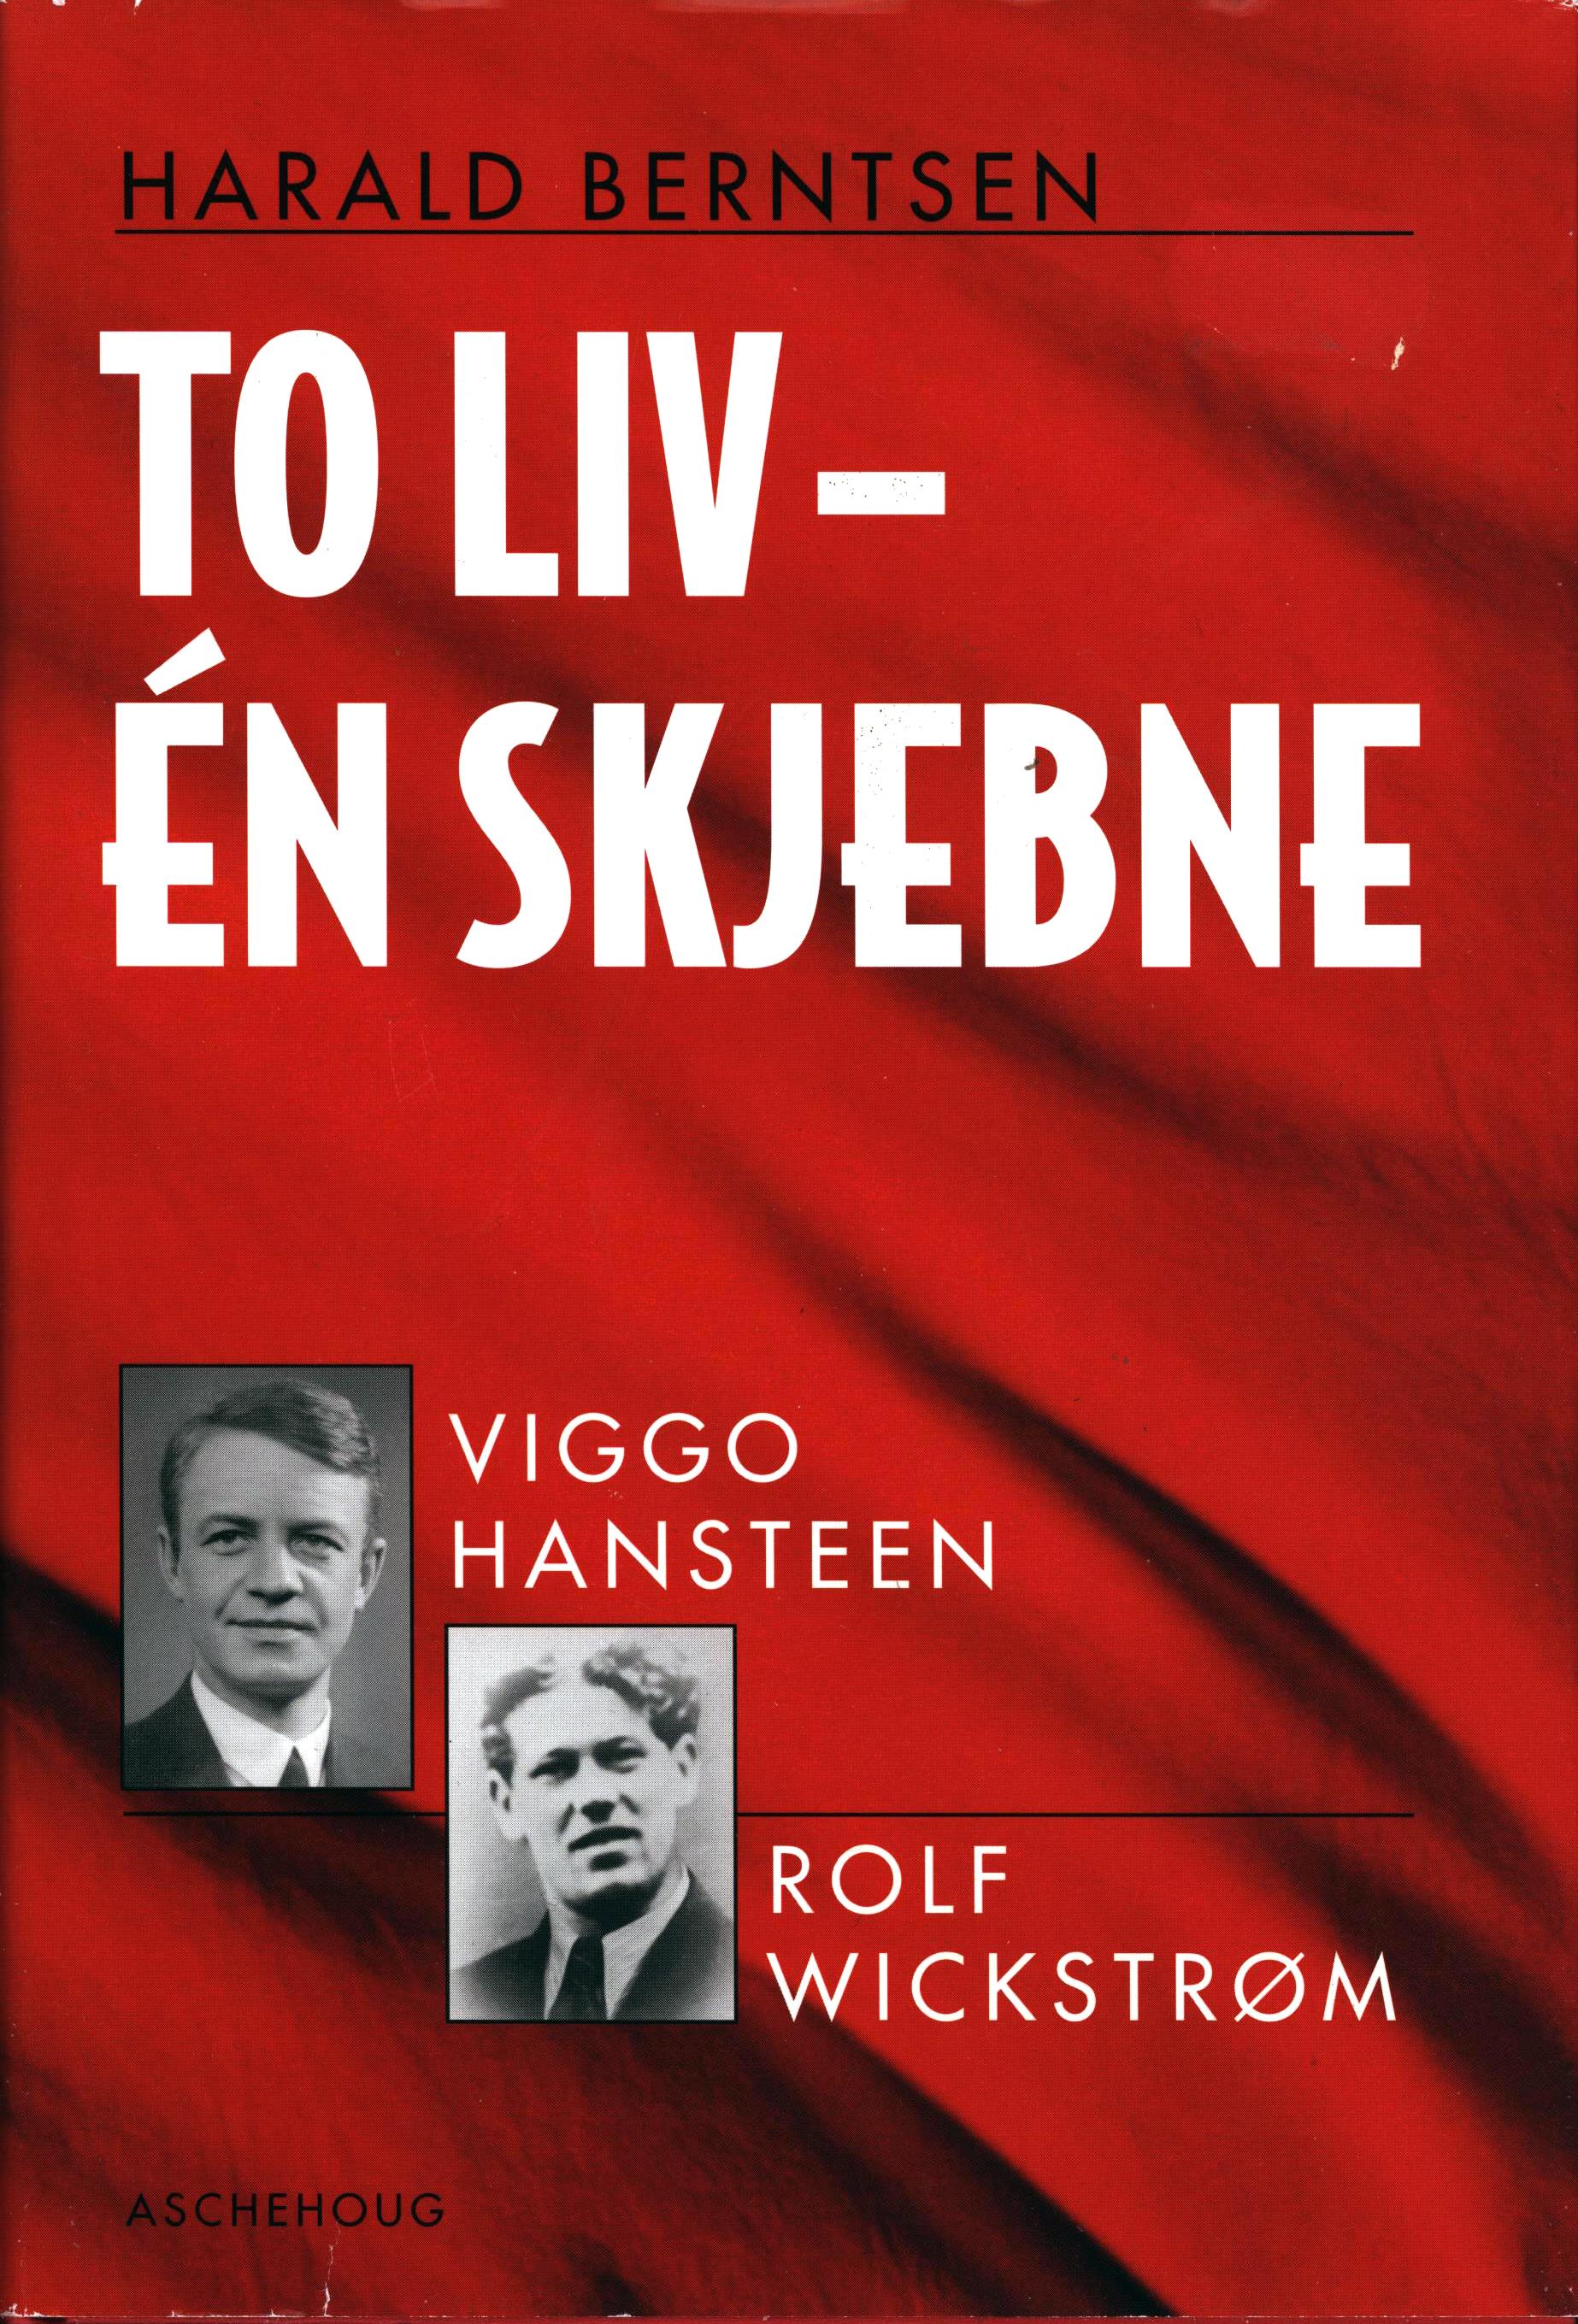 Harald Berntsen: To liv - Én skjebne - Viggo Hansteen og Rolf Wickstrøm